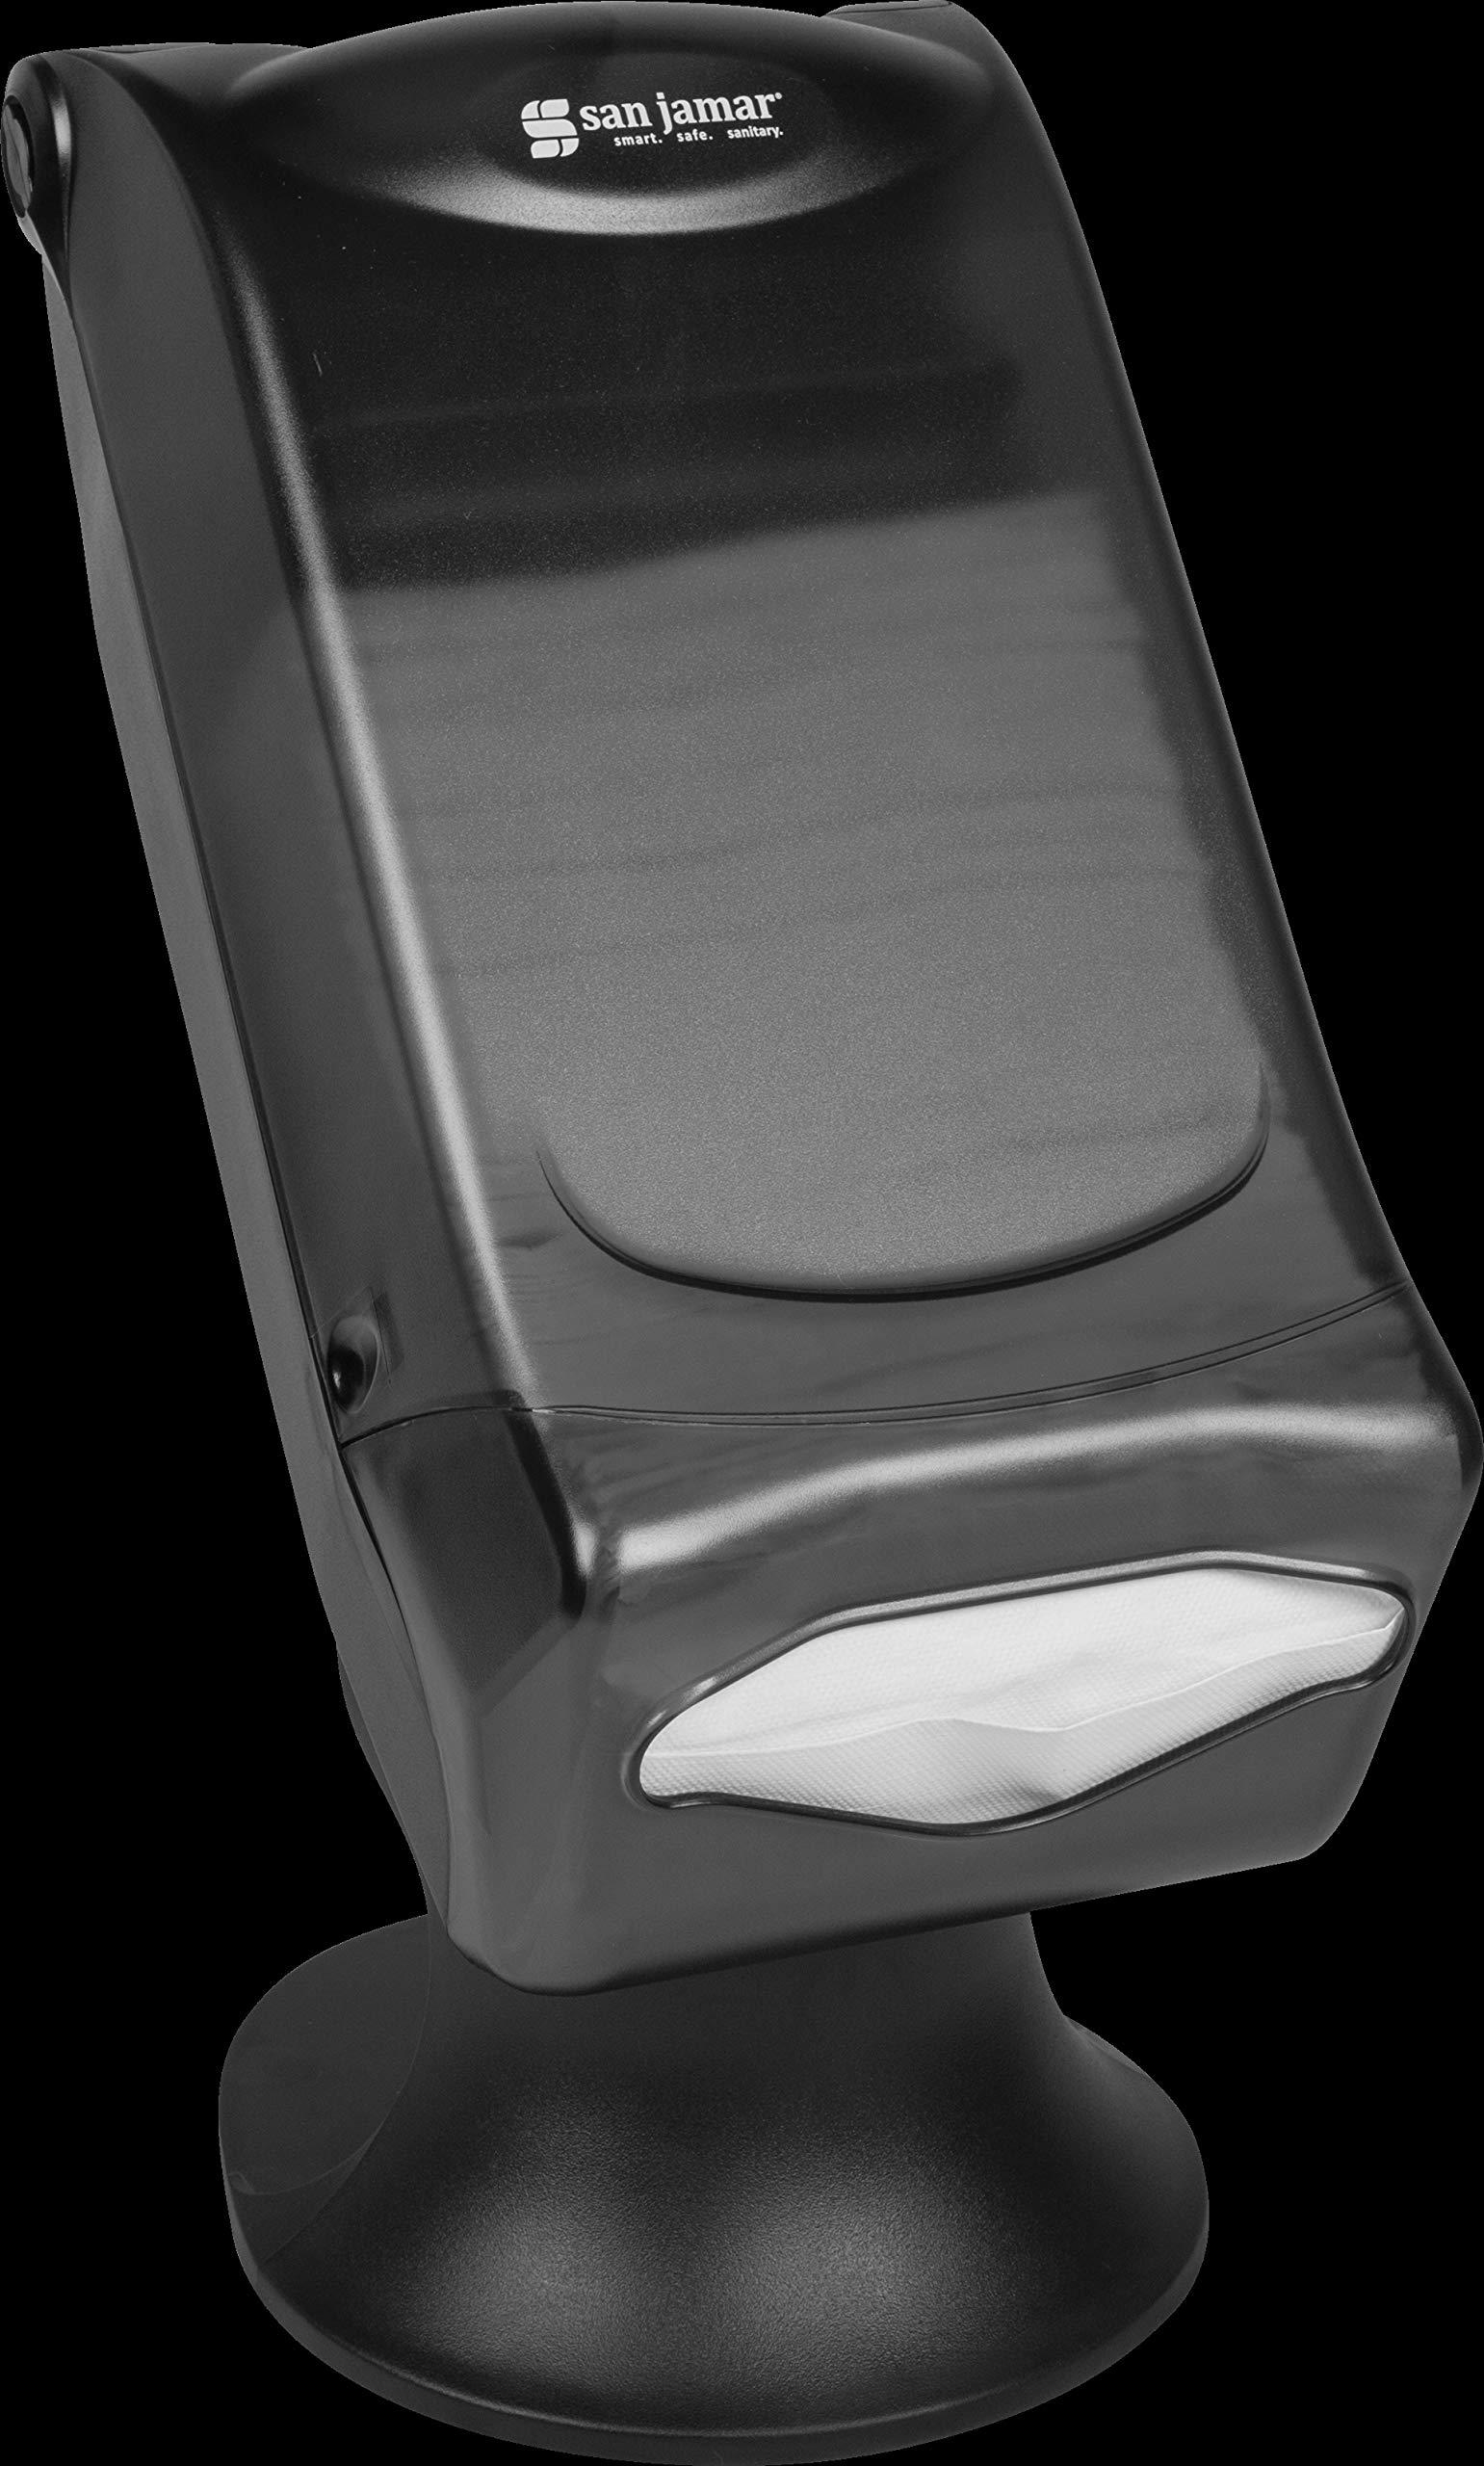 San Jamar H5005S Venue Fullfold Control Napkin Dispenser with Stand, 500 Capacity, 8'' Width x 17-1/2'' Height x 13'' Depth, Black Pearl by San Jamar (Image #7)